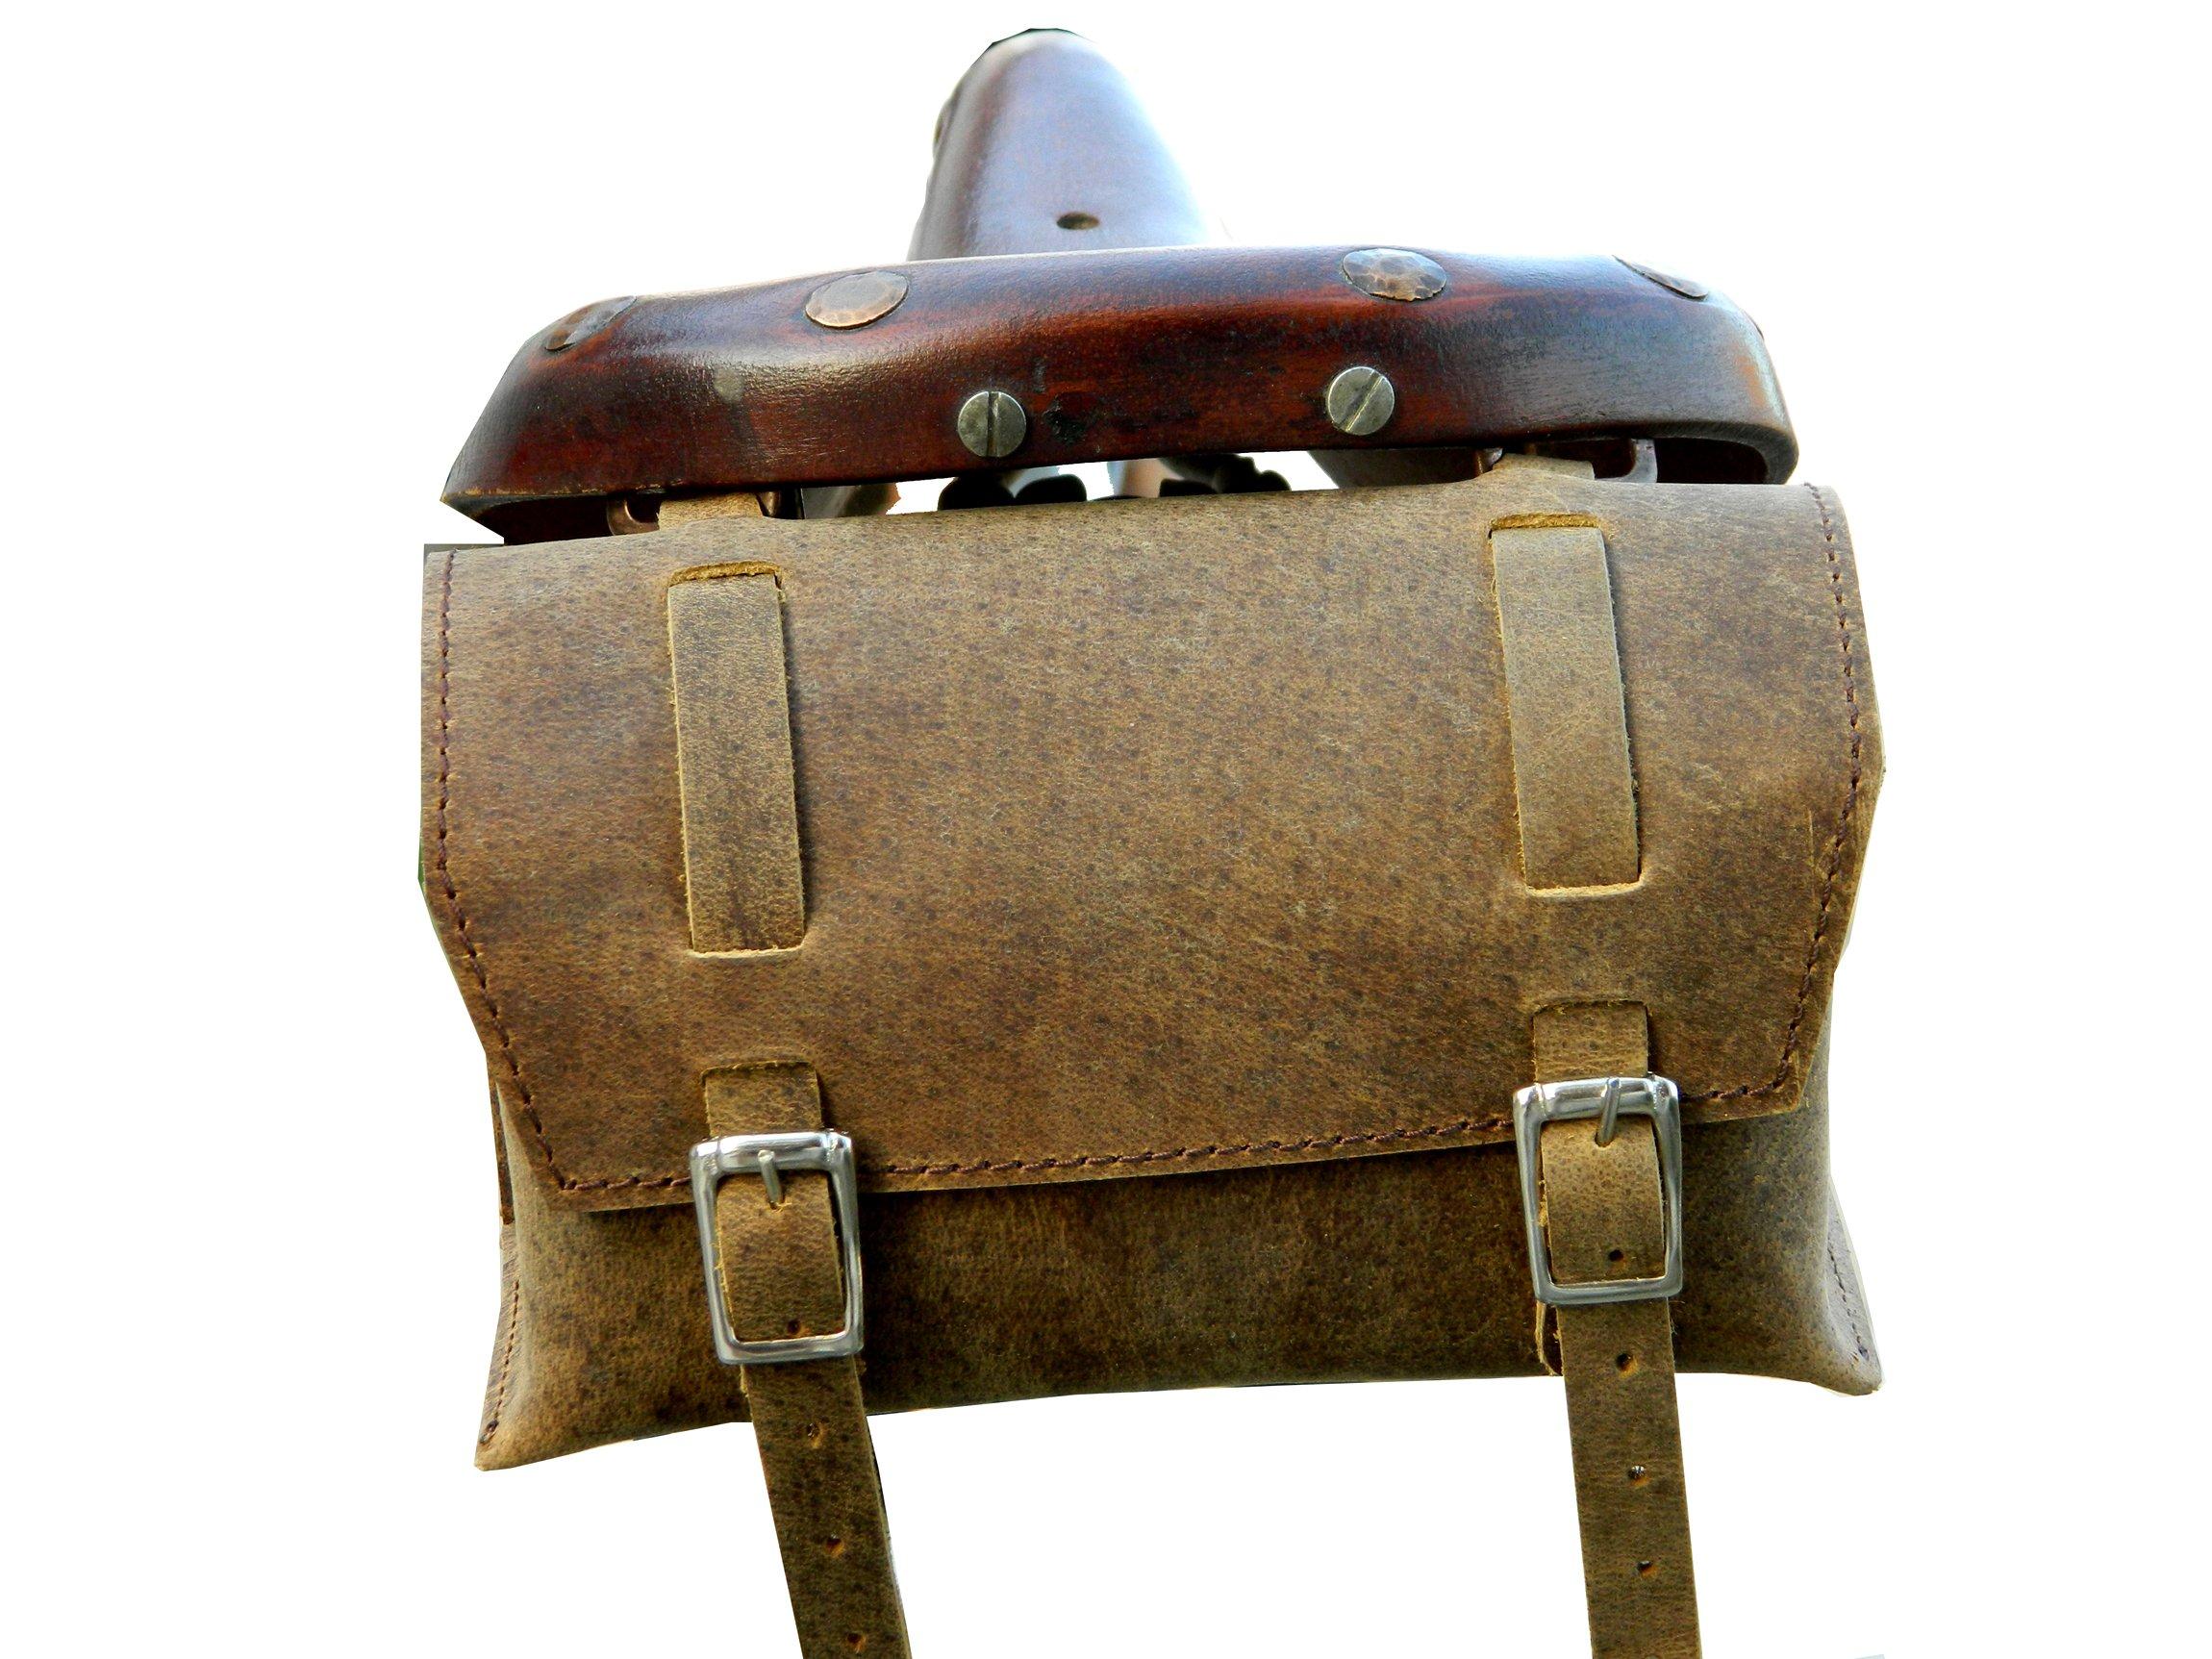 Herte Genuine Leather Bicycle Saddle Box Bag Utility Vintage Bag br by Herte (Image #2)